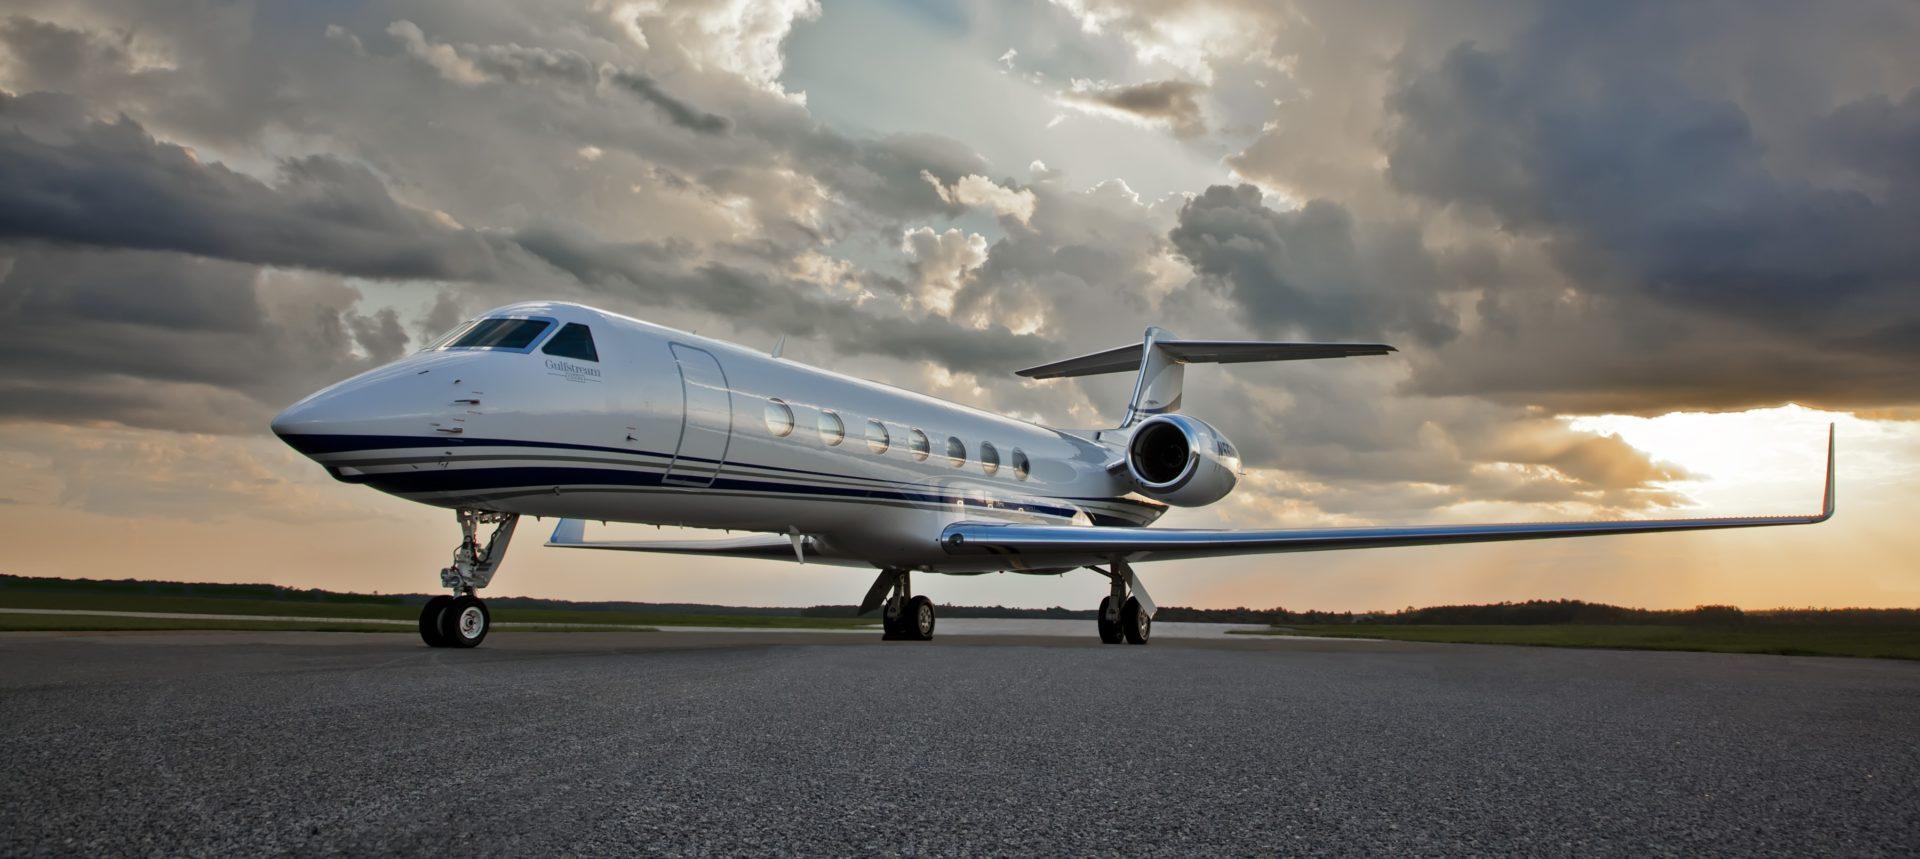 Gulfstream G550 sky crop